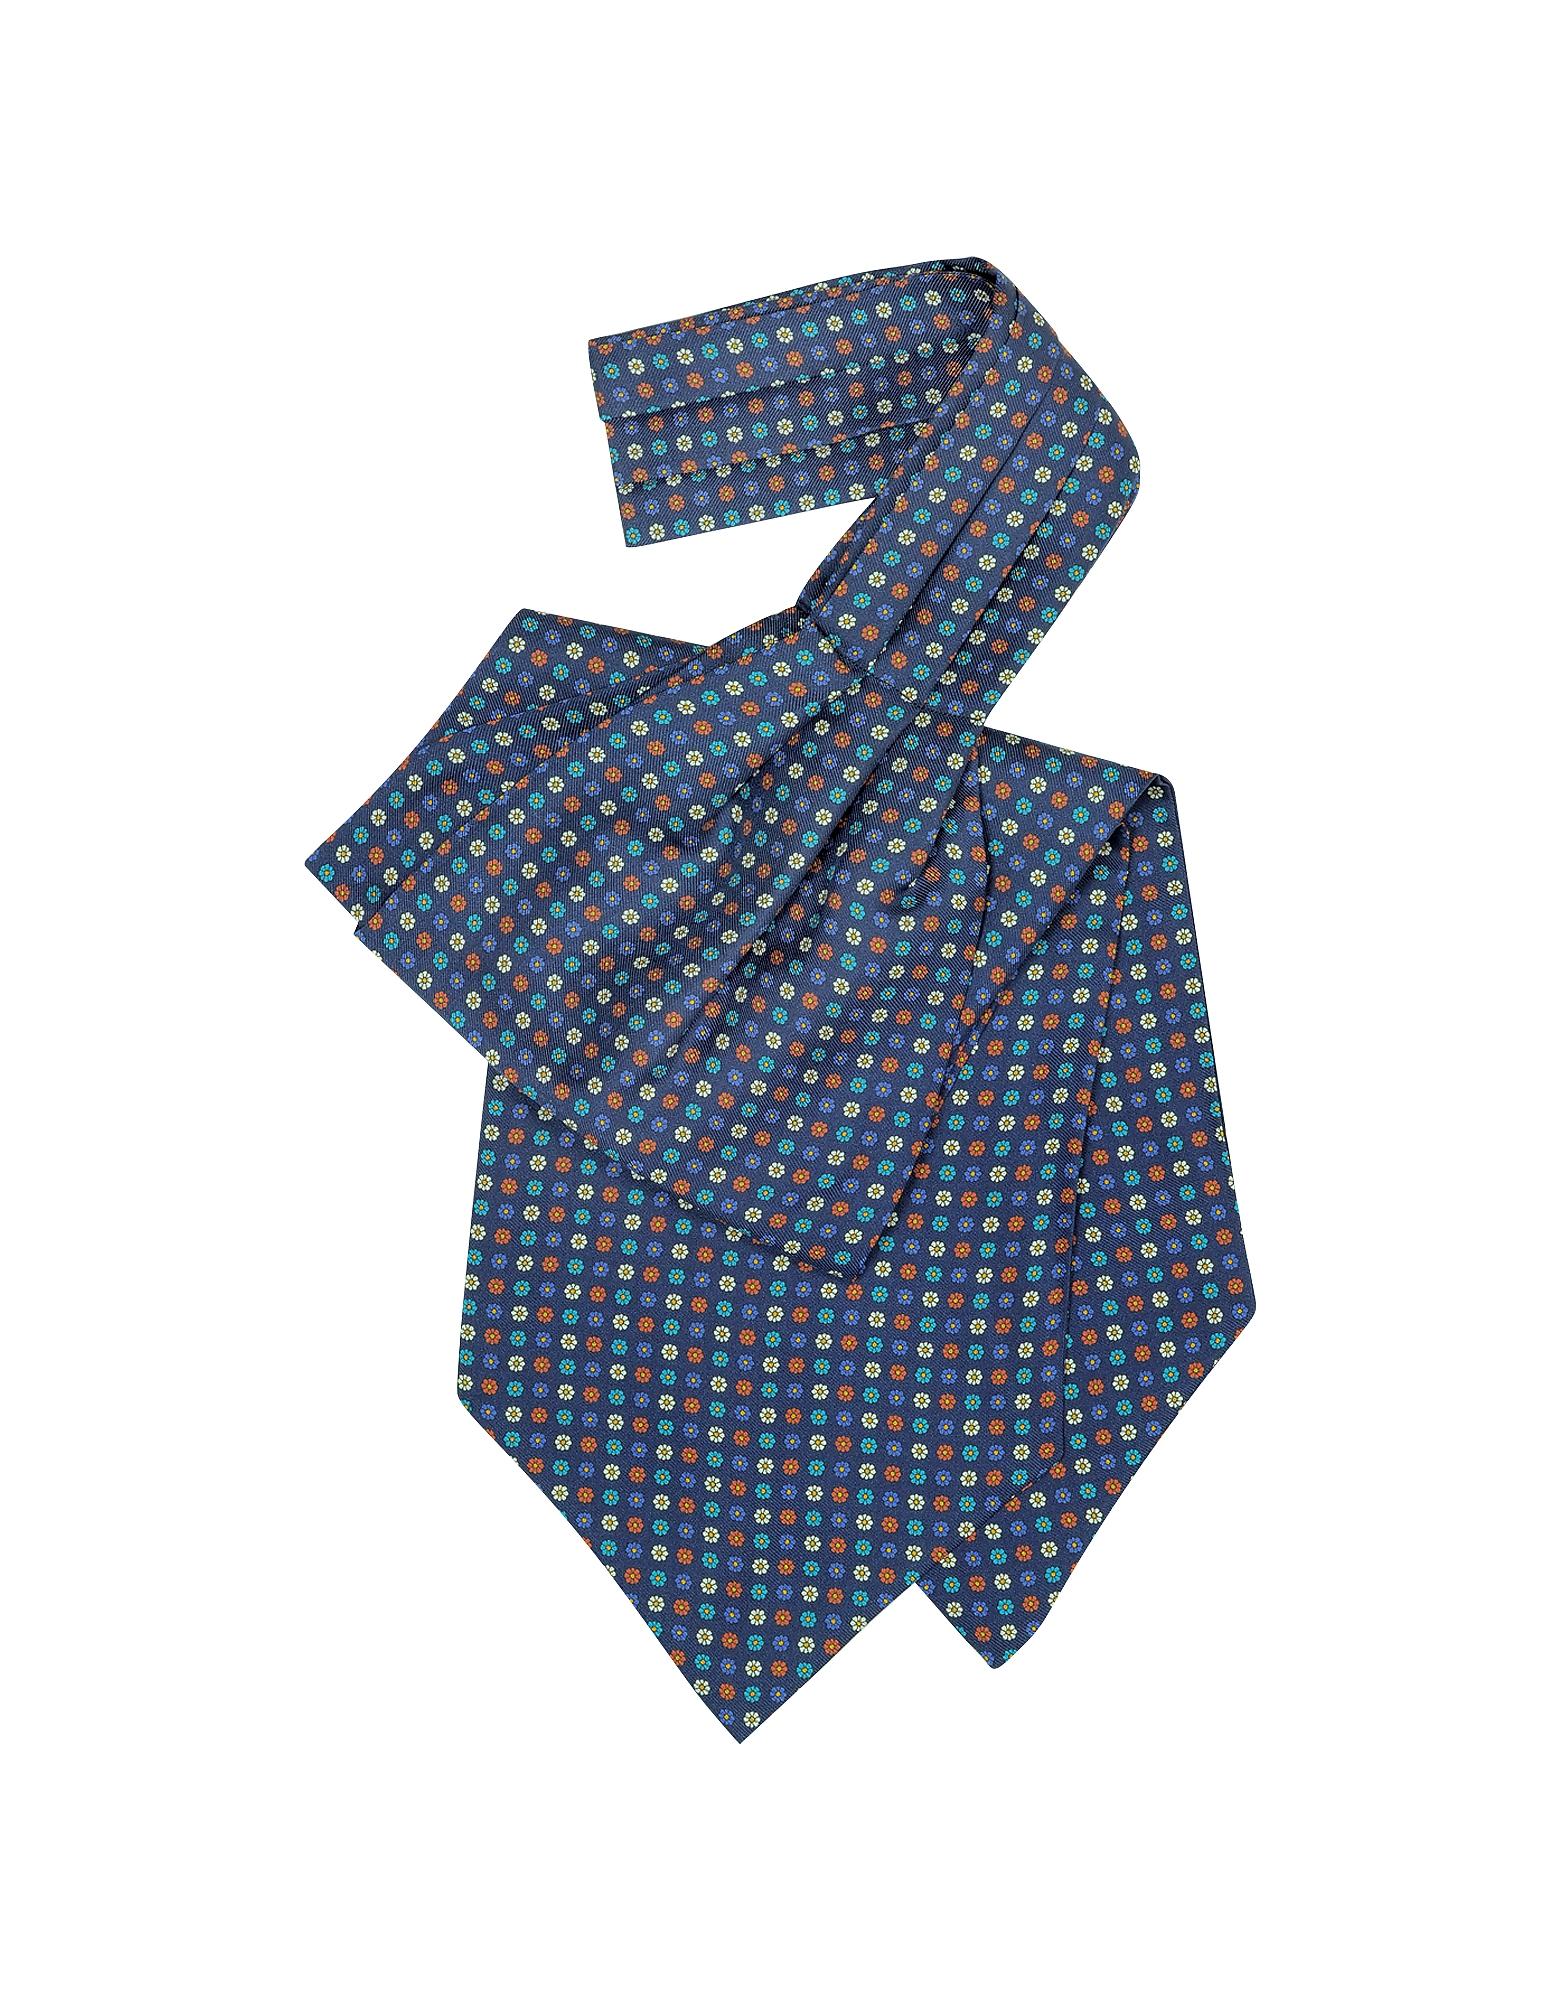 Forzieri Ascot ties, Multicolor Floral Print Silk Ascot